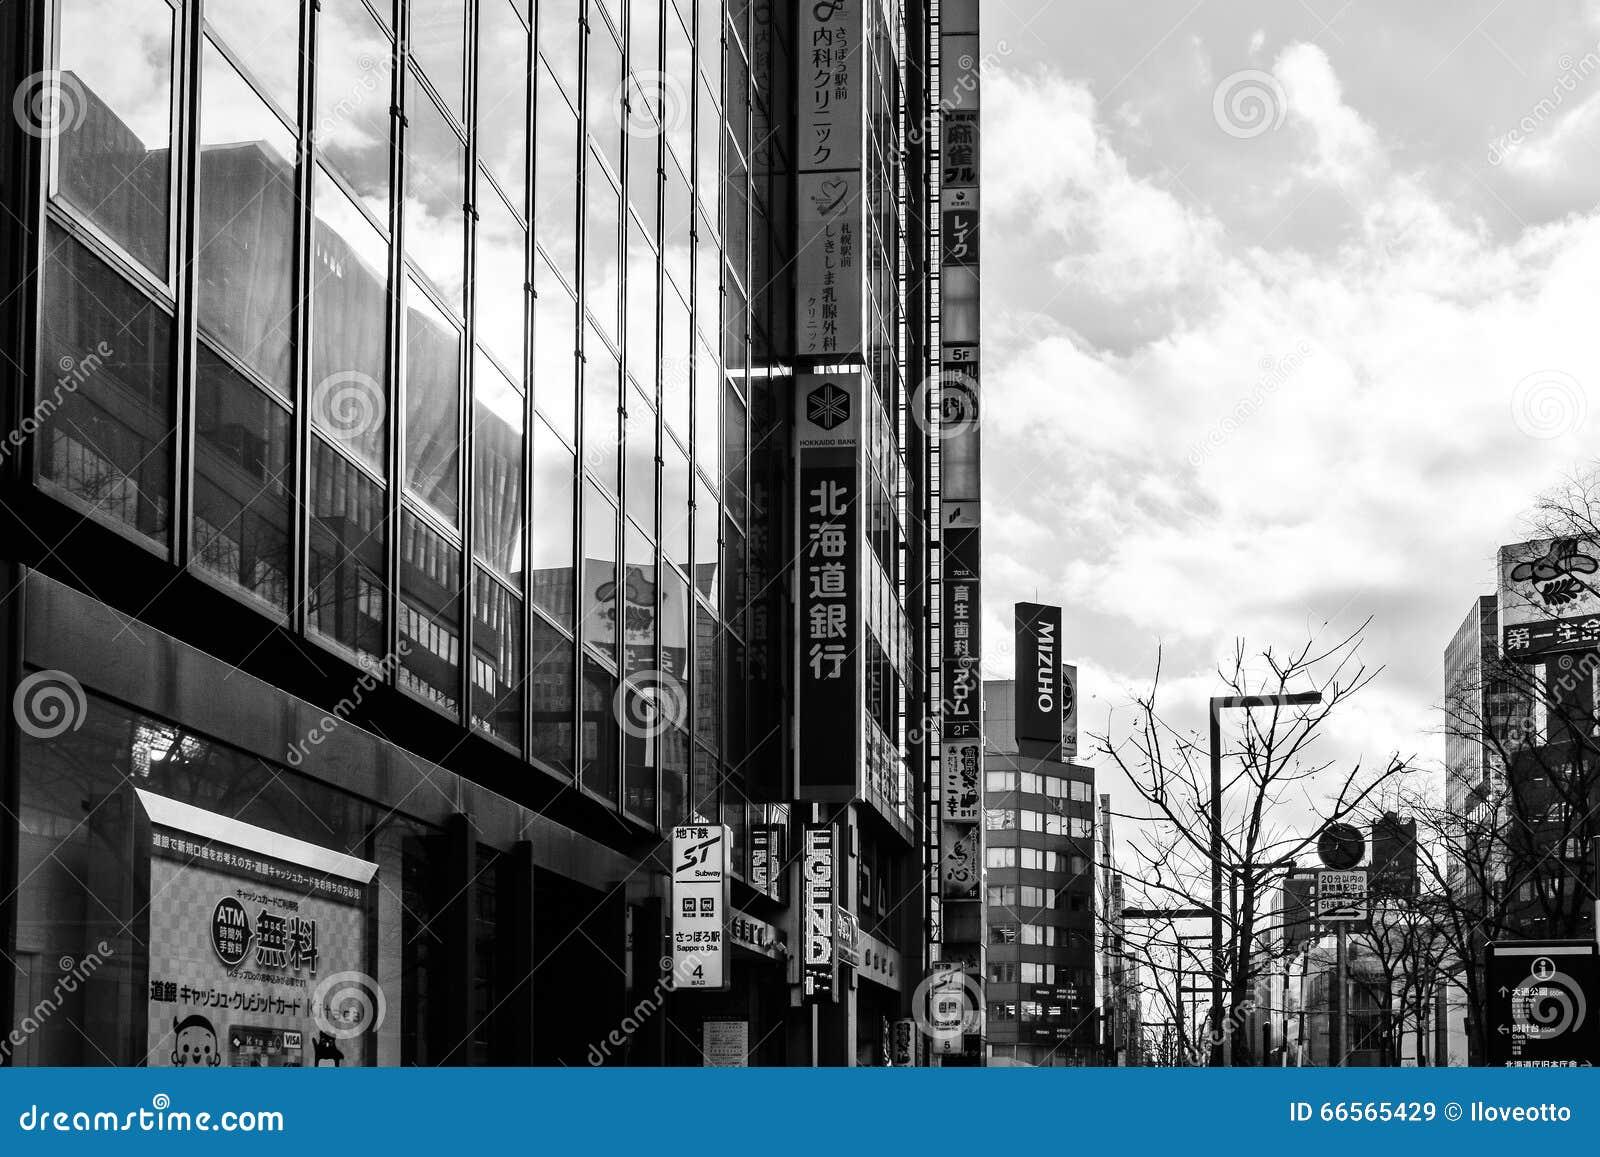 Street View Of Buildings Around City Editorial Stock Image Image